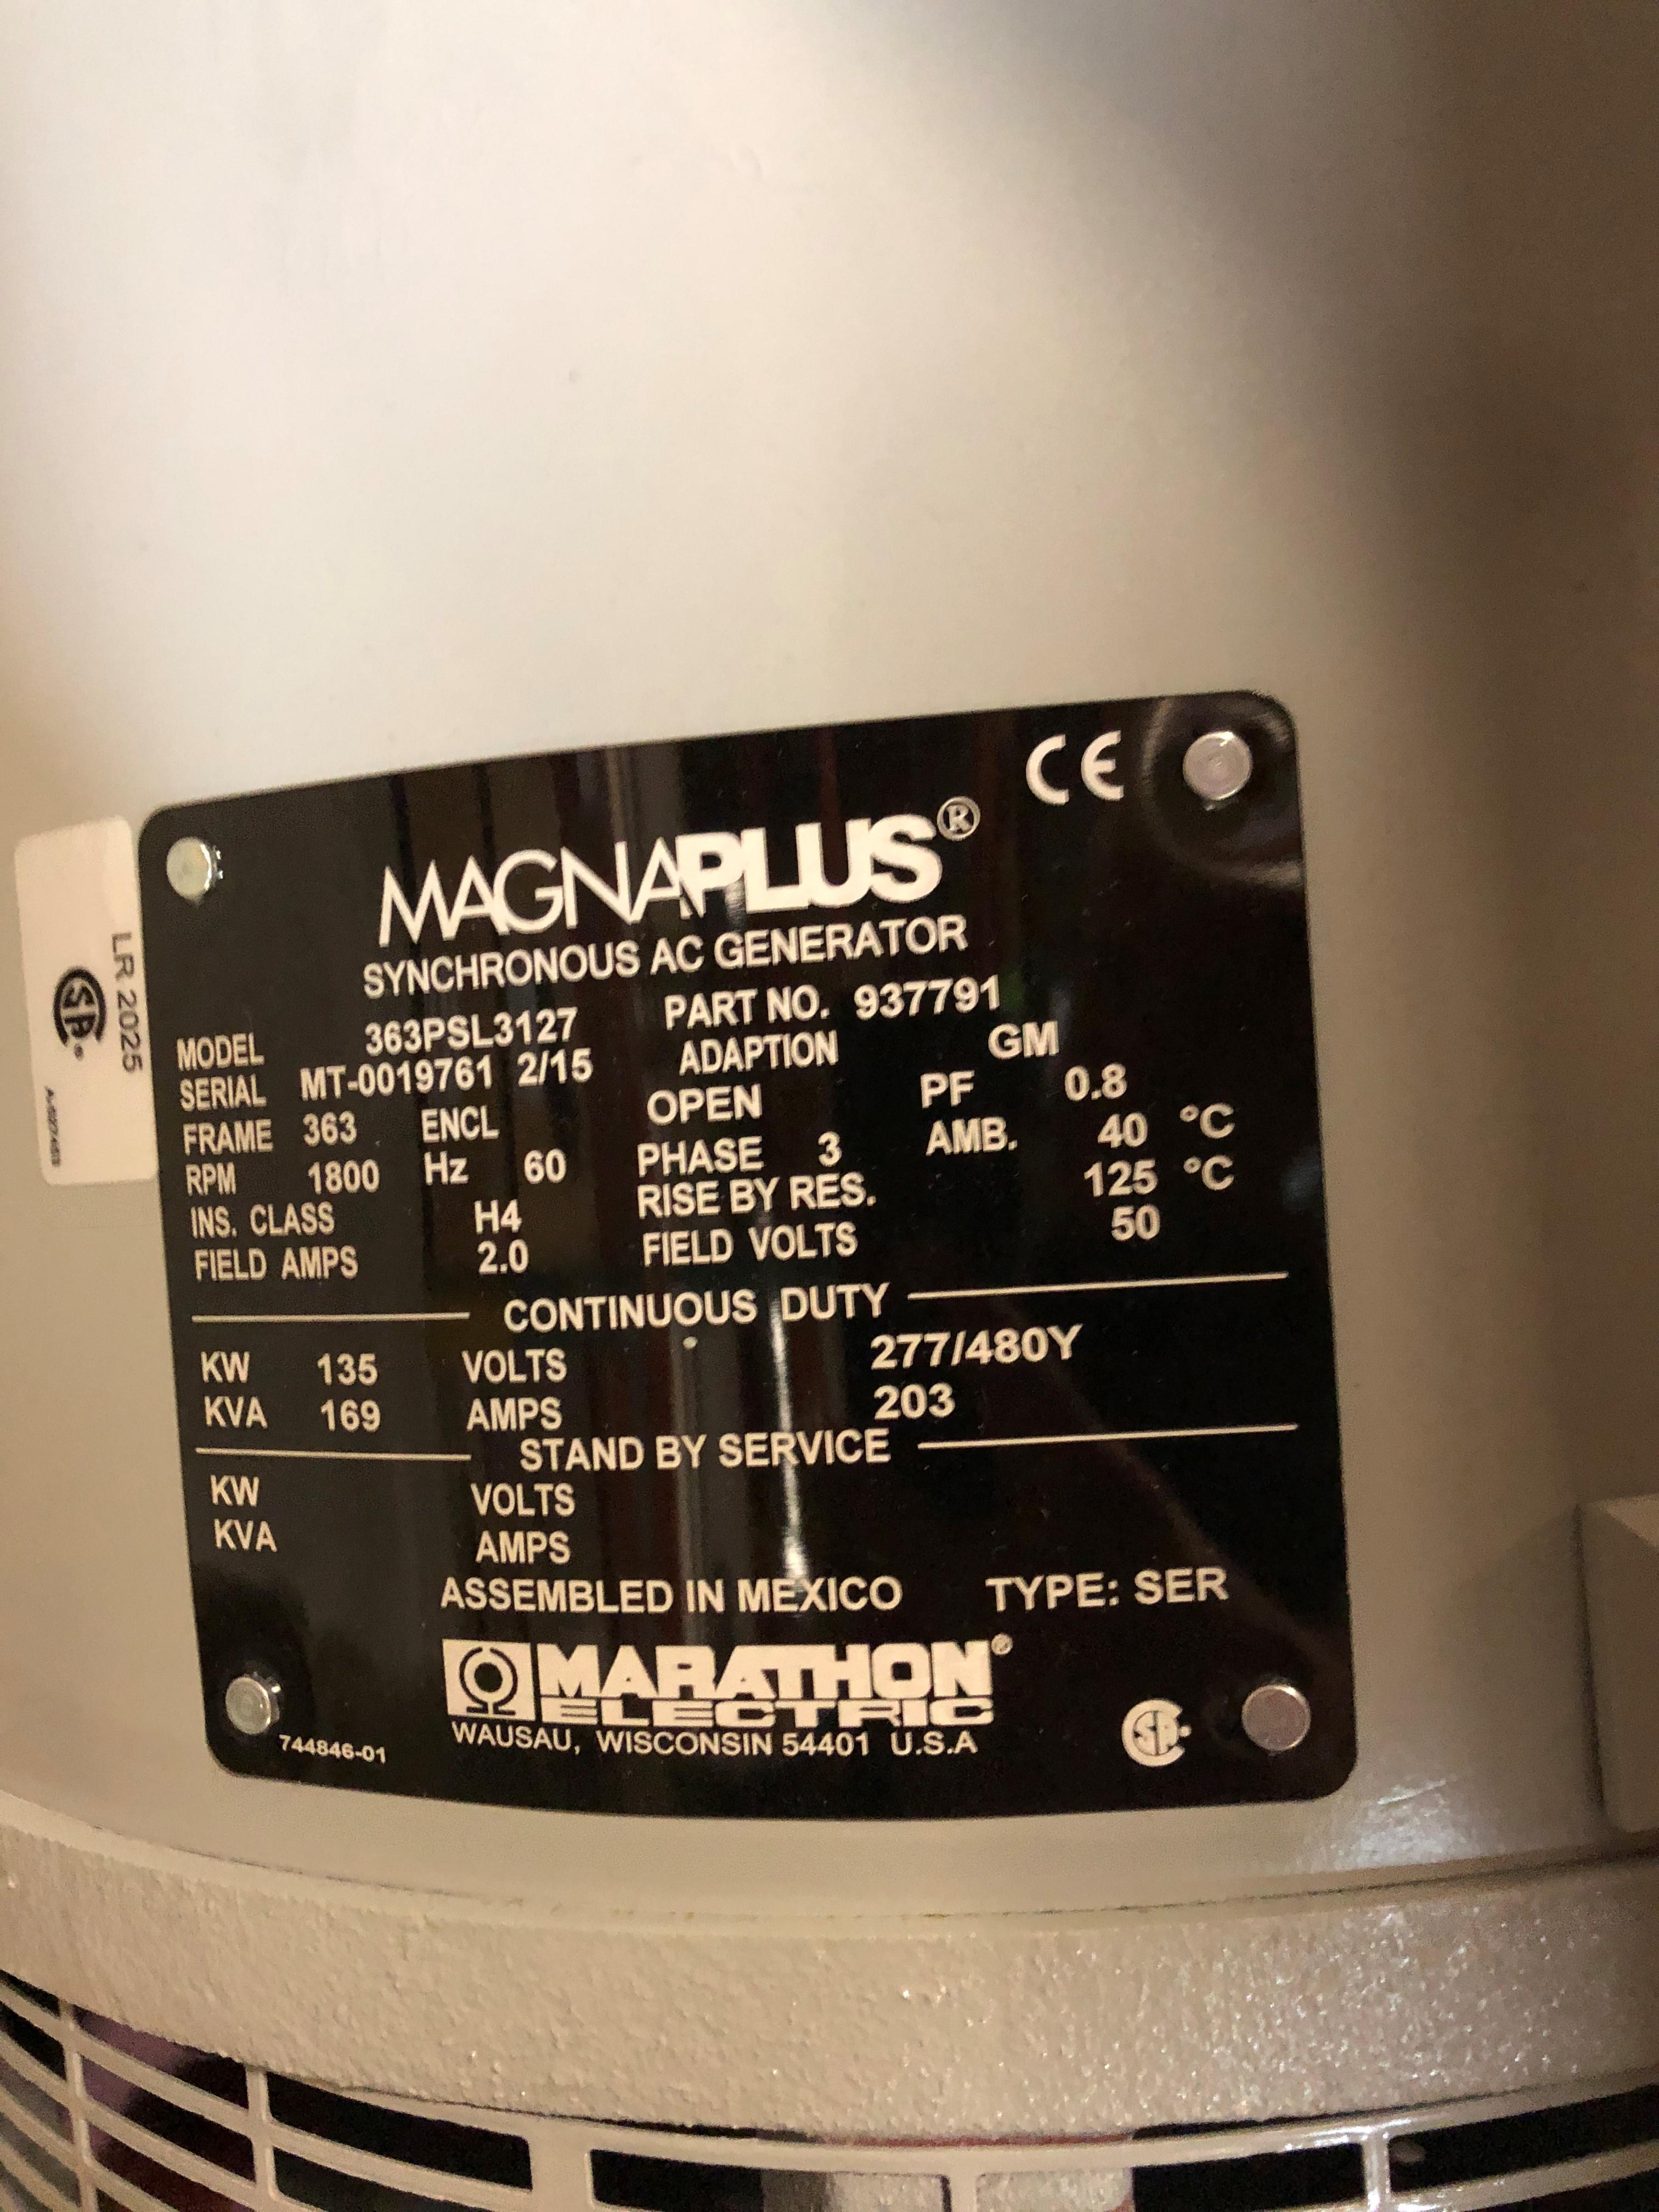 Lot 3 - MAGNAPLUS SYNCHRONOUS GENERATOR MODEL-363PSL3127; 135KW/480V/4POLE/3PH/60HZ/1800RPM/363FRAME